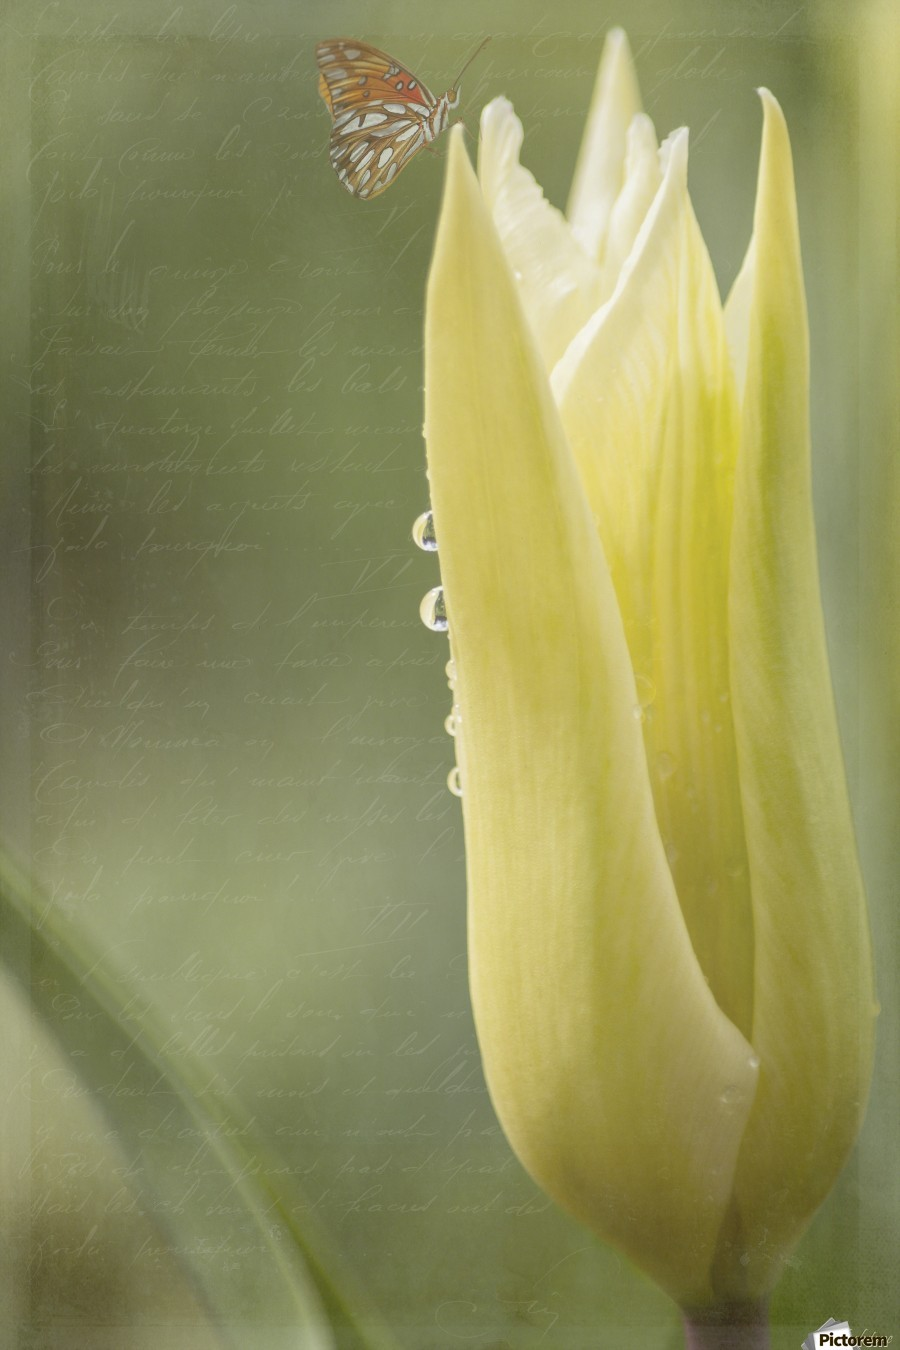 Spirit Of Love - Spring Art by Jordan Blackstone  Print